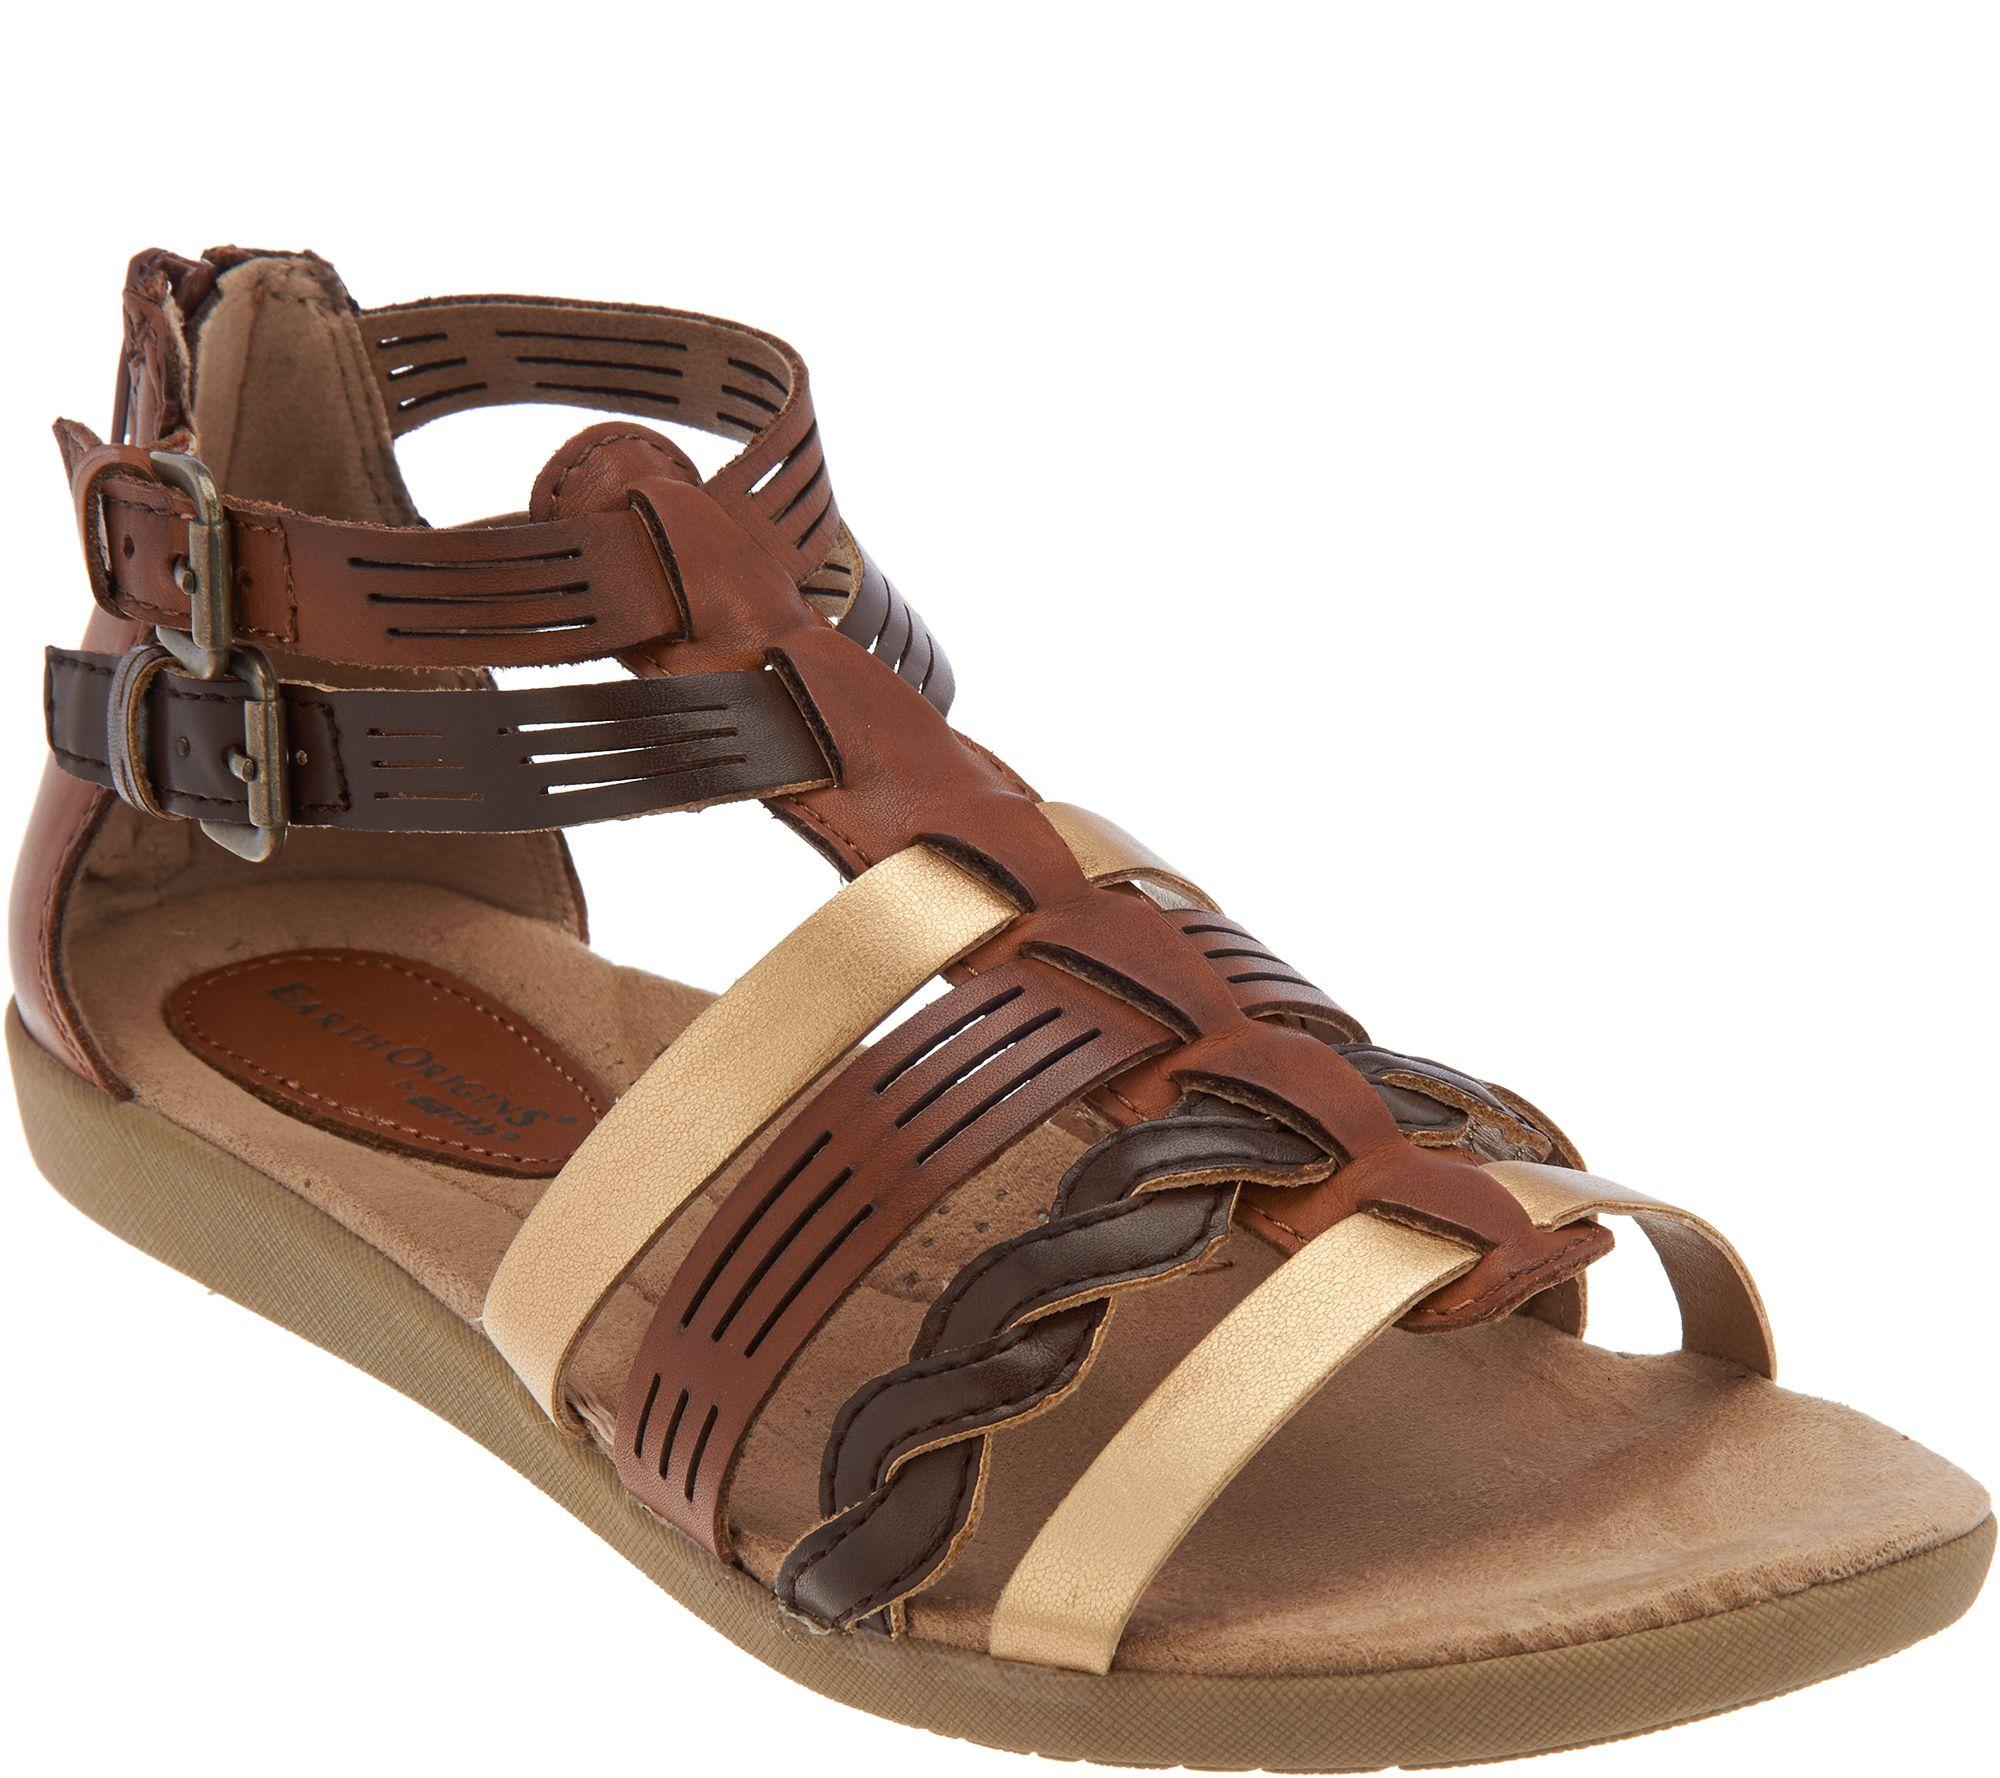 earth origins leather multi strap sandals nicole page 1. Black Bedroom Furniture Sets. Home Design Ideas